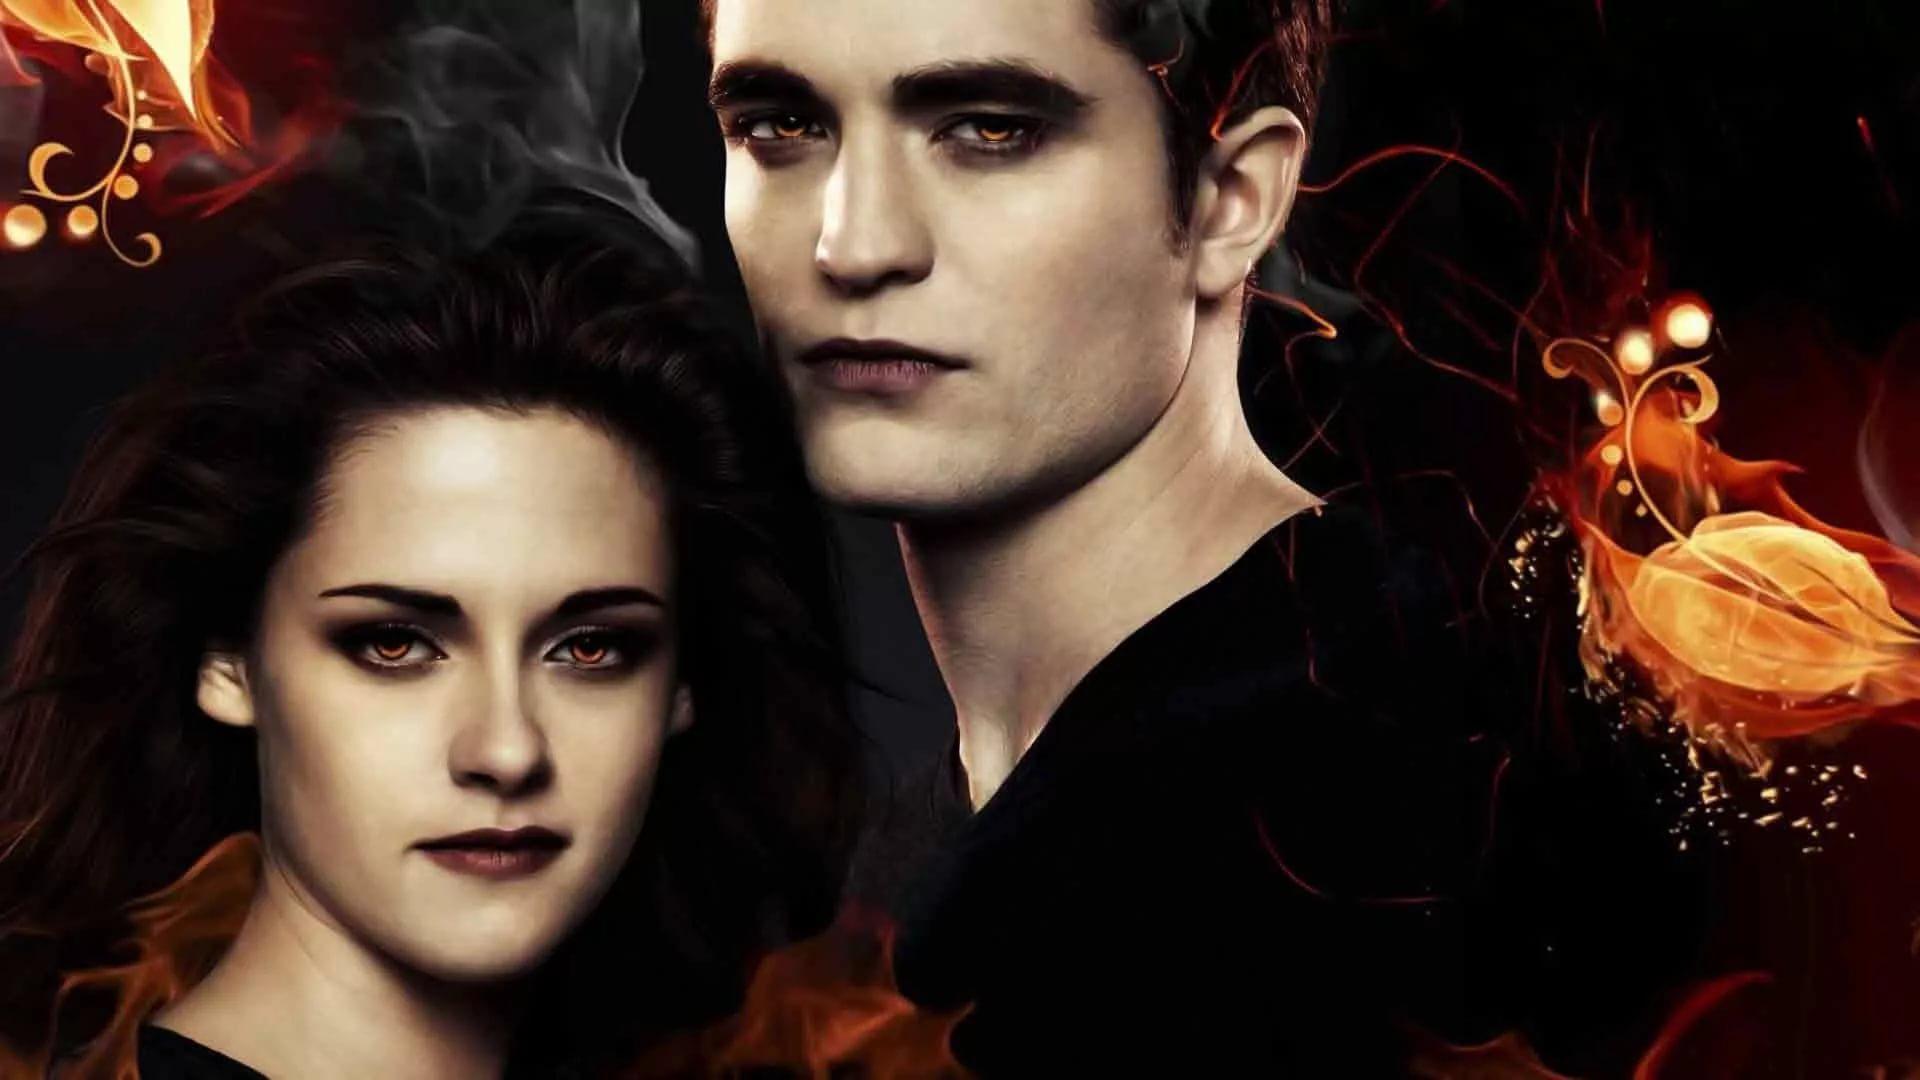 Twilight Saga Background Wallpaper HD